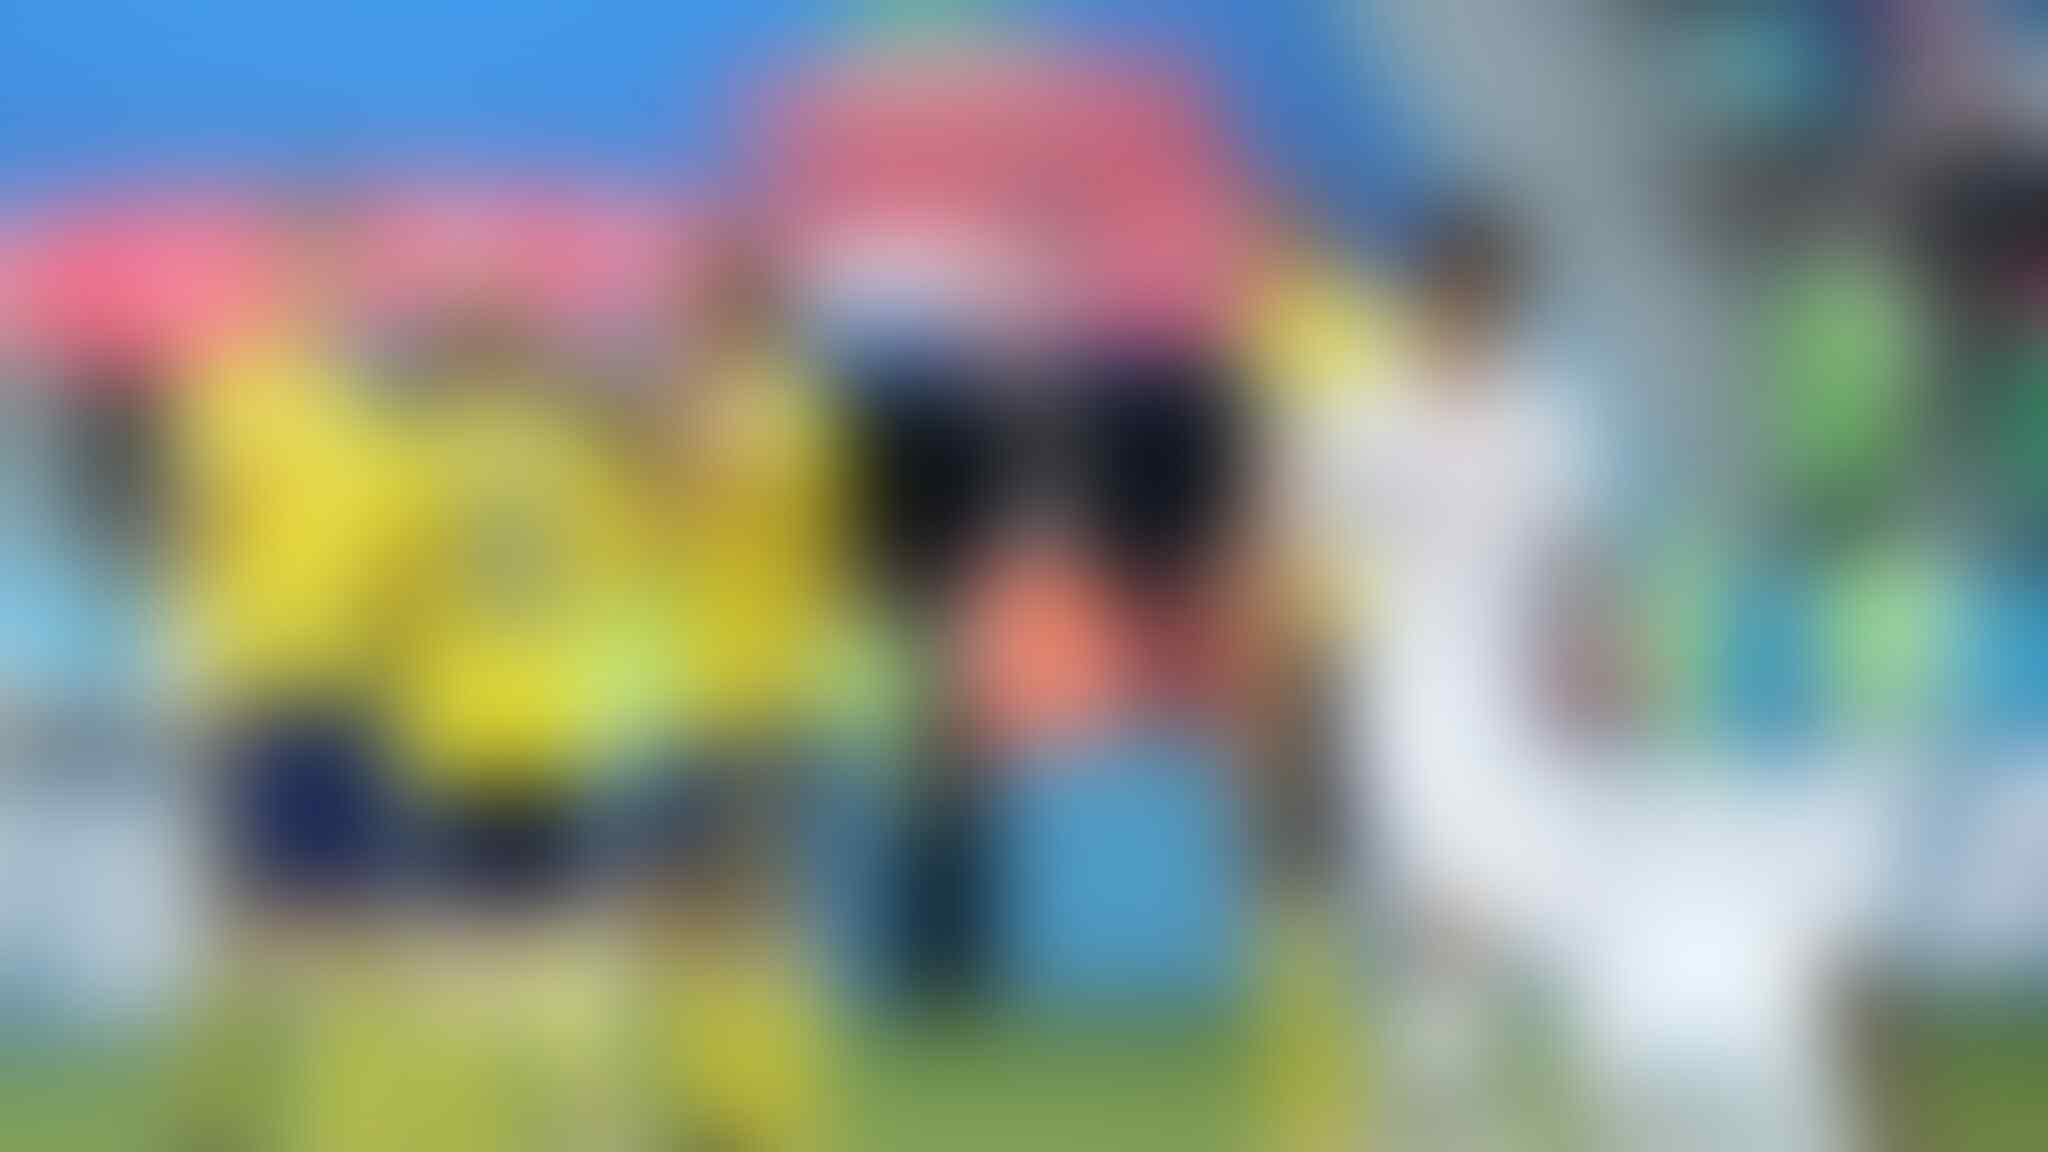 Piala Dunia 2018: Hasil Lengkap Penyisihan Grup F